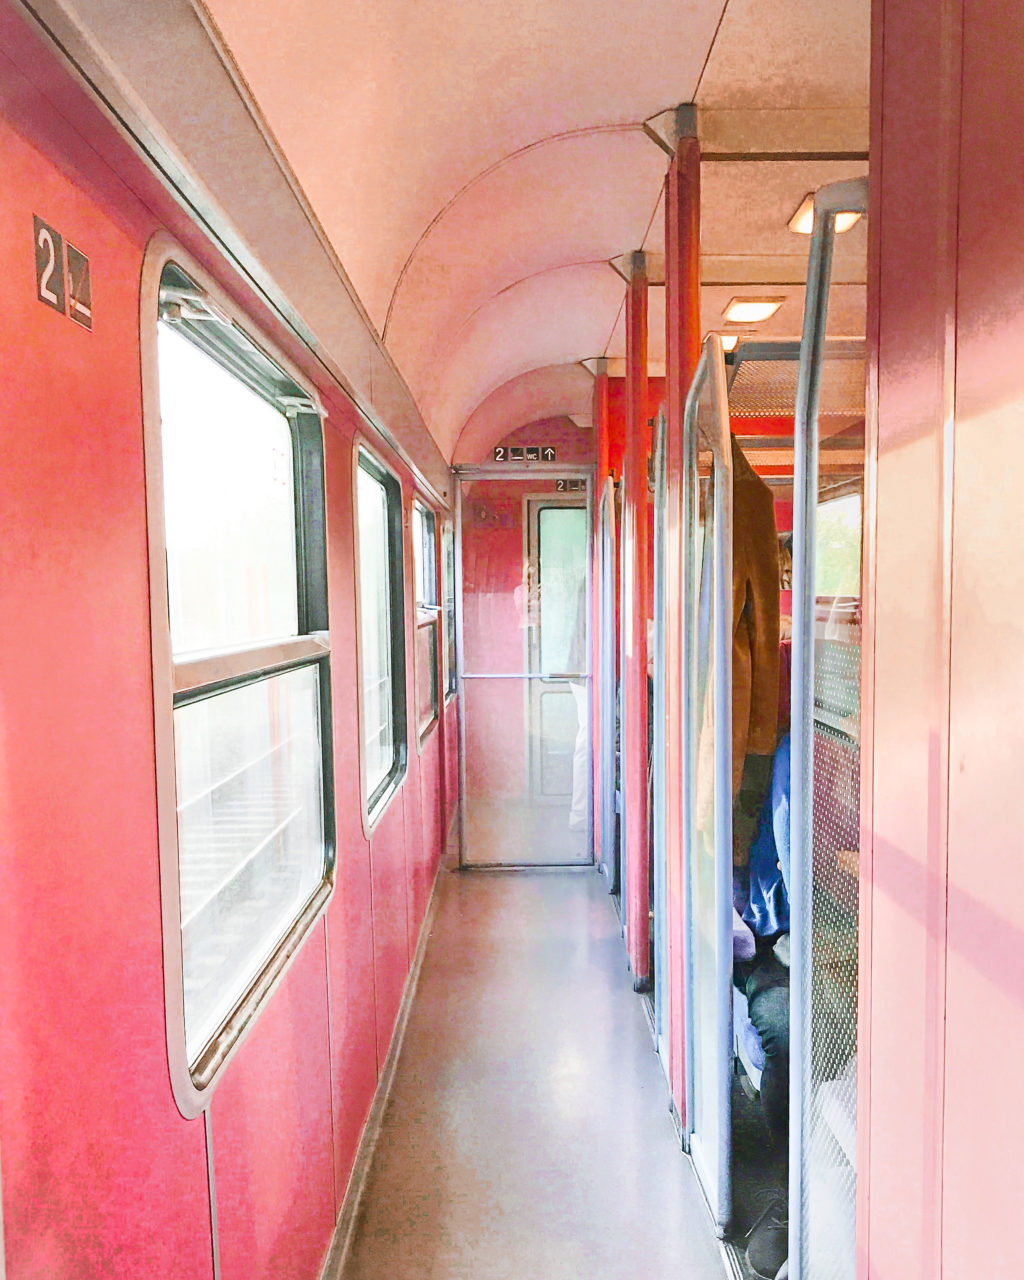 pink train car